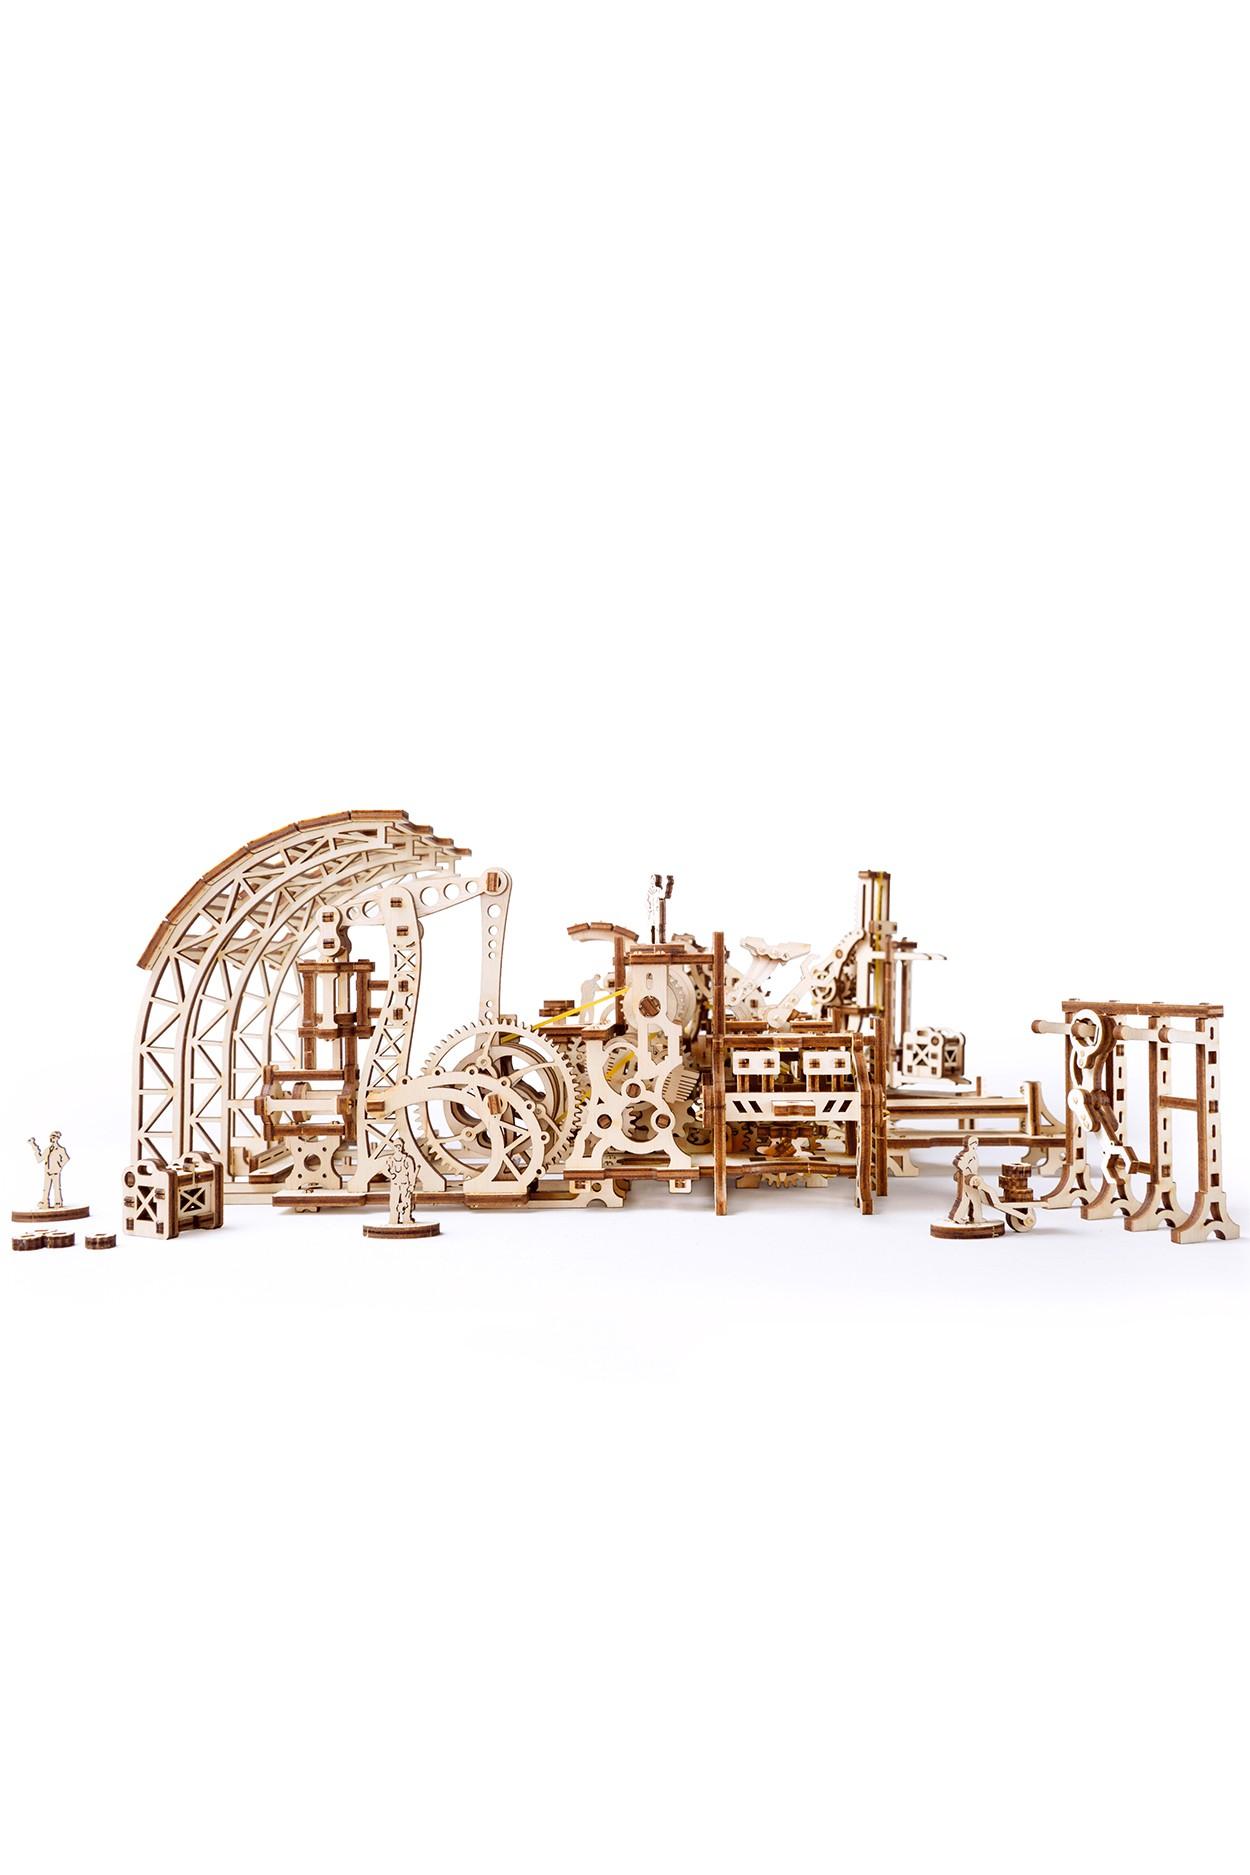 Конструктор 3D-пазл Ugears Фабрика роботов в Ярославле